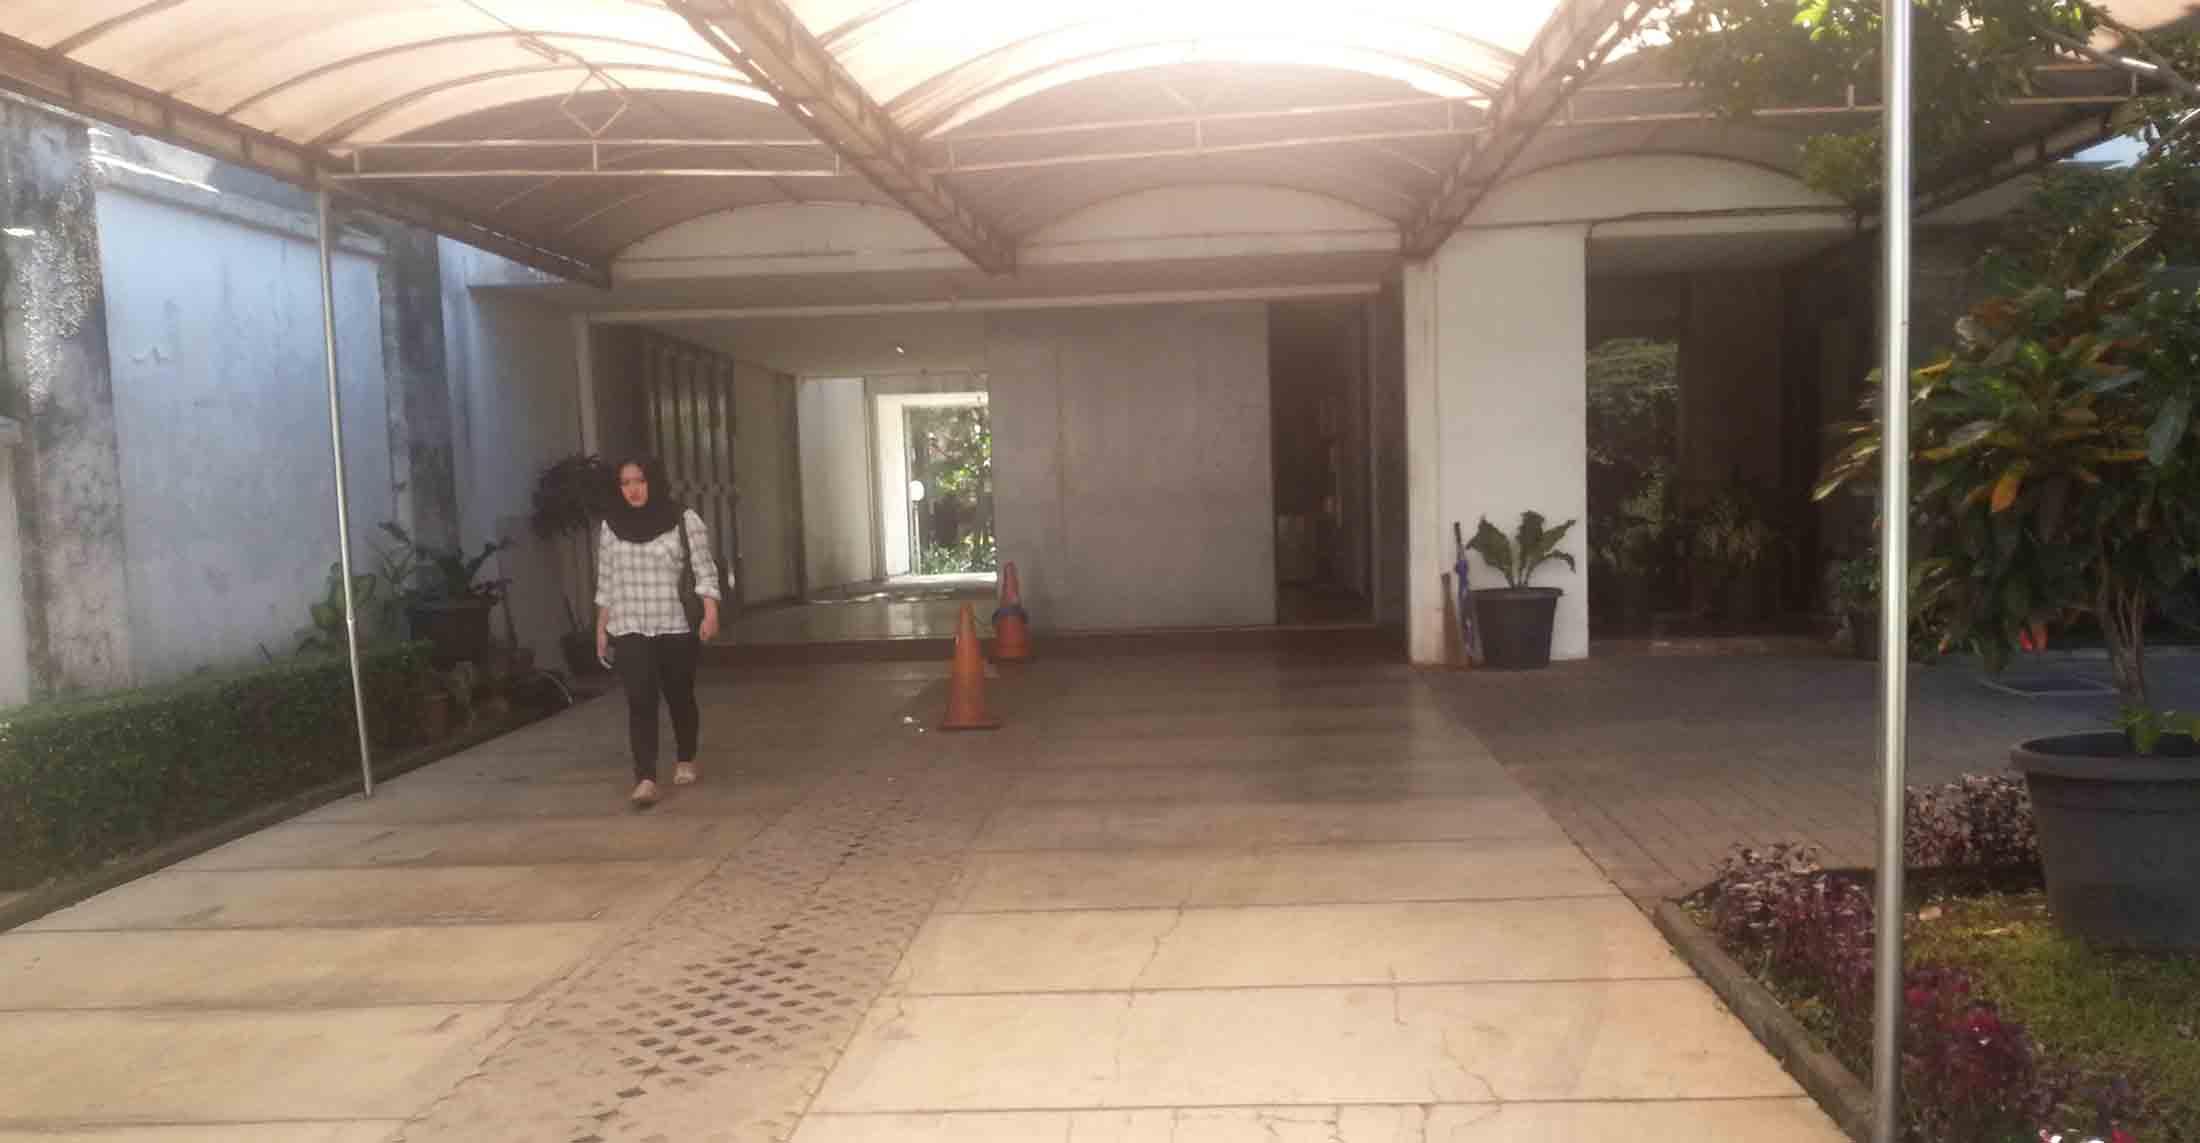 Butuh Ruangan Lagi, BSP Akan Tempati Bekas Kantor Yayasan